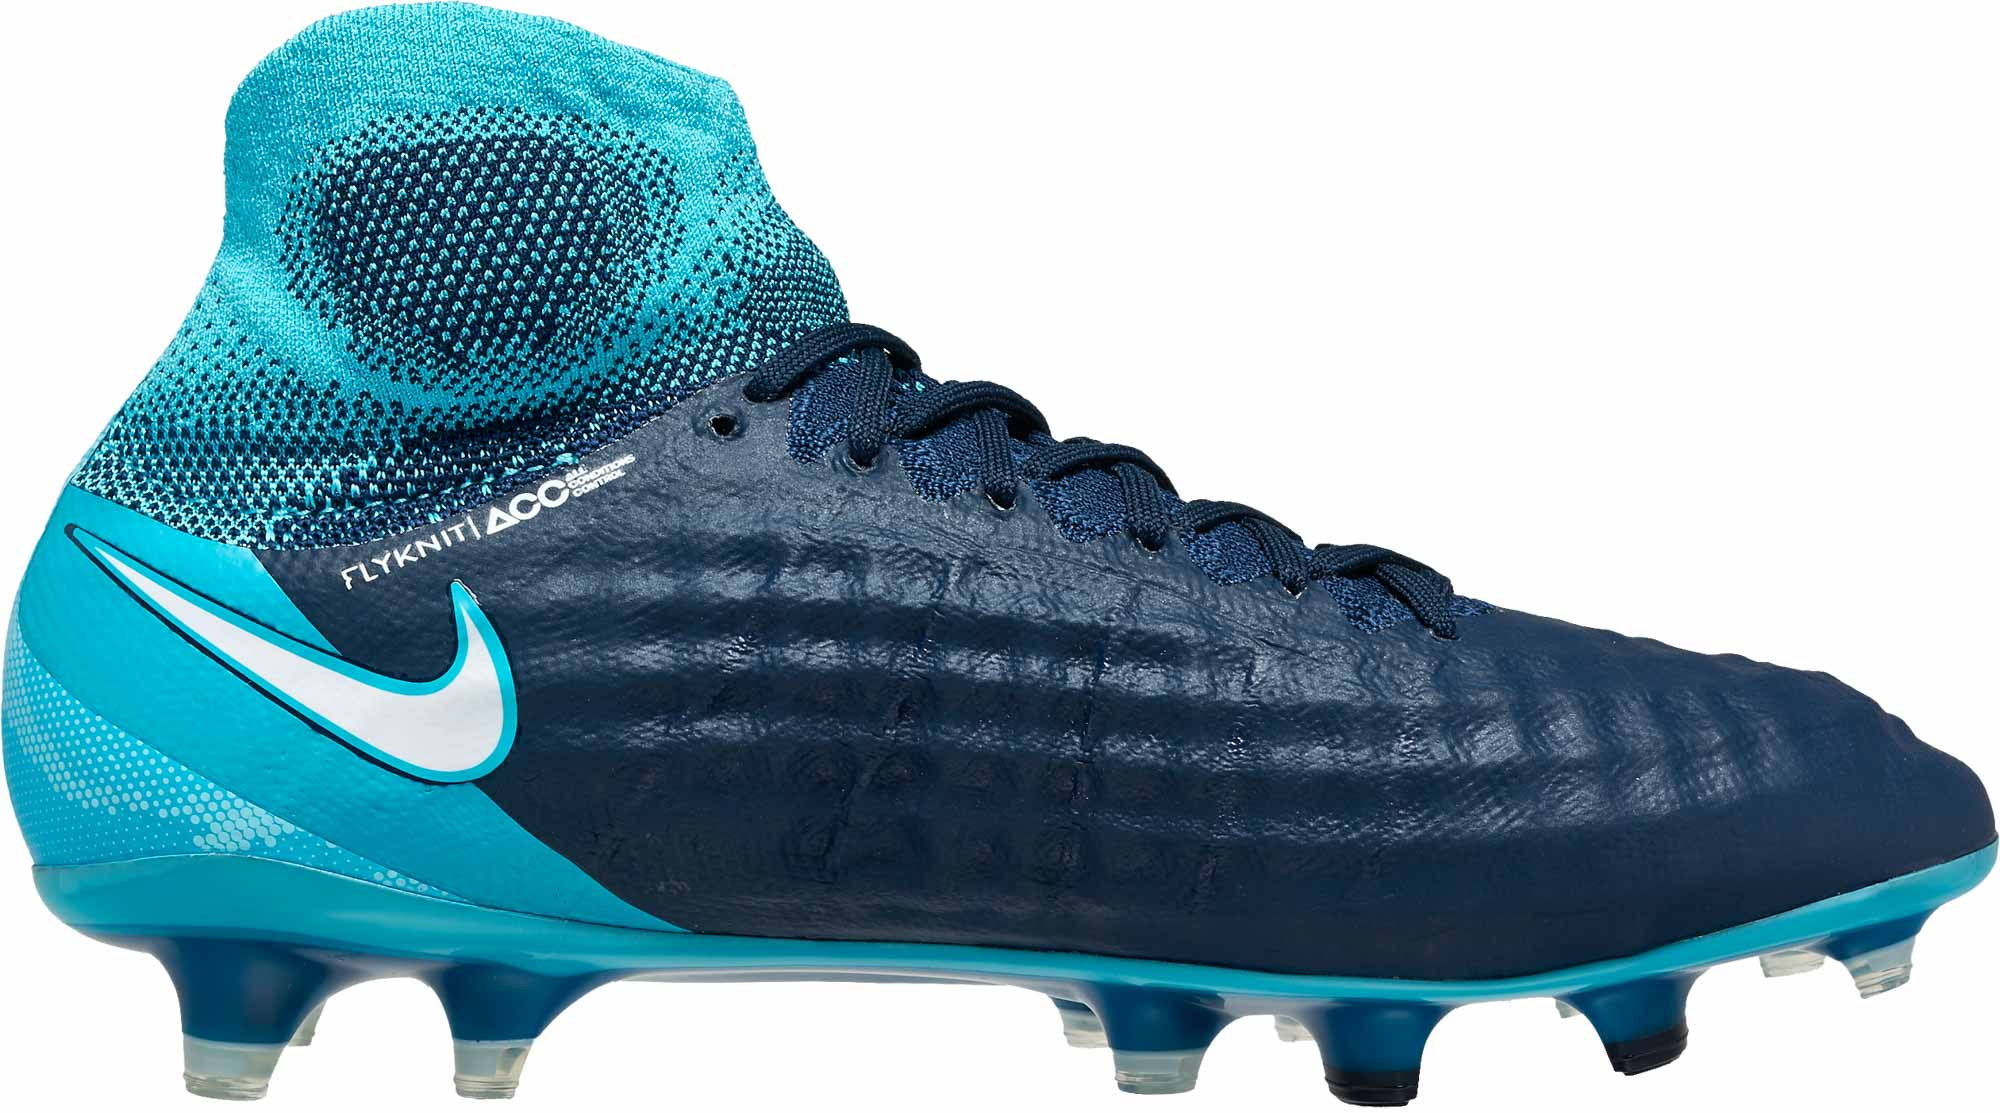 Nike Magista Obra II FG - Obsidian & White - Soccer Master